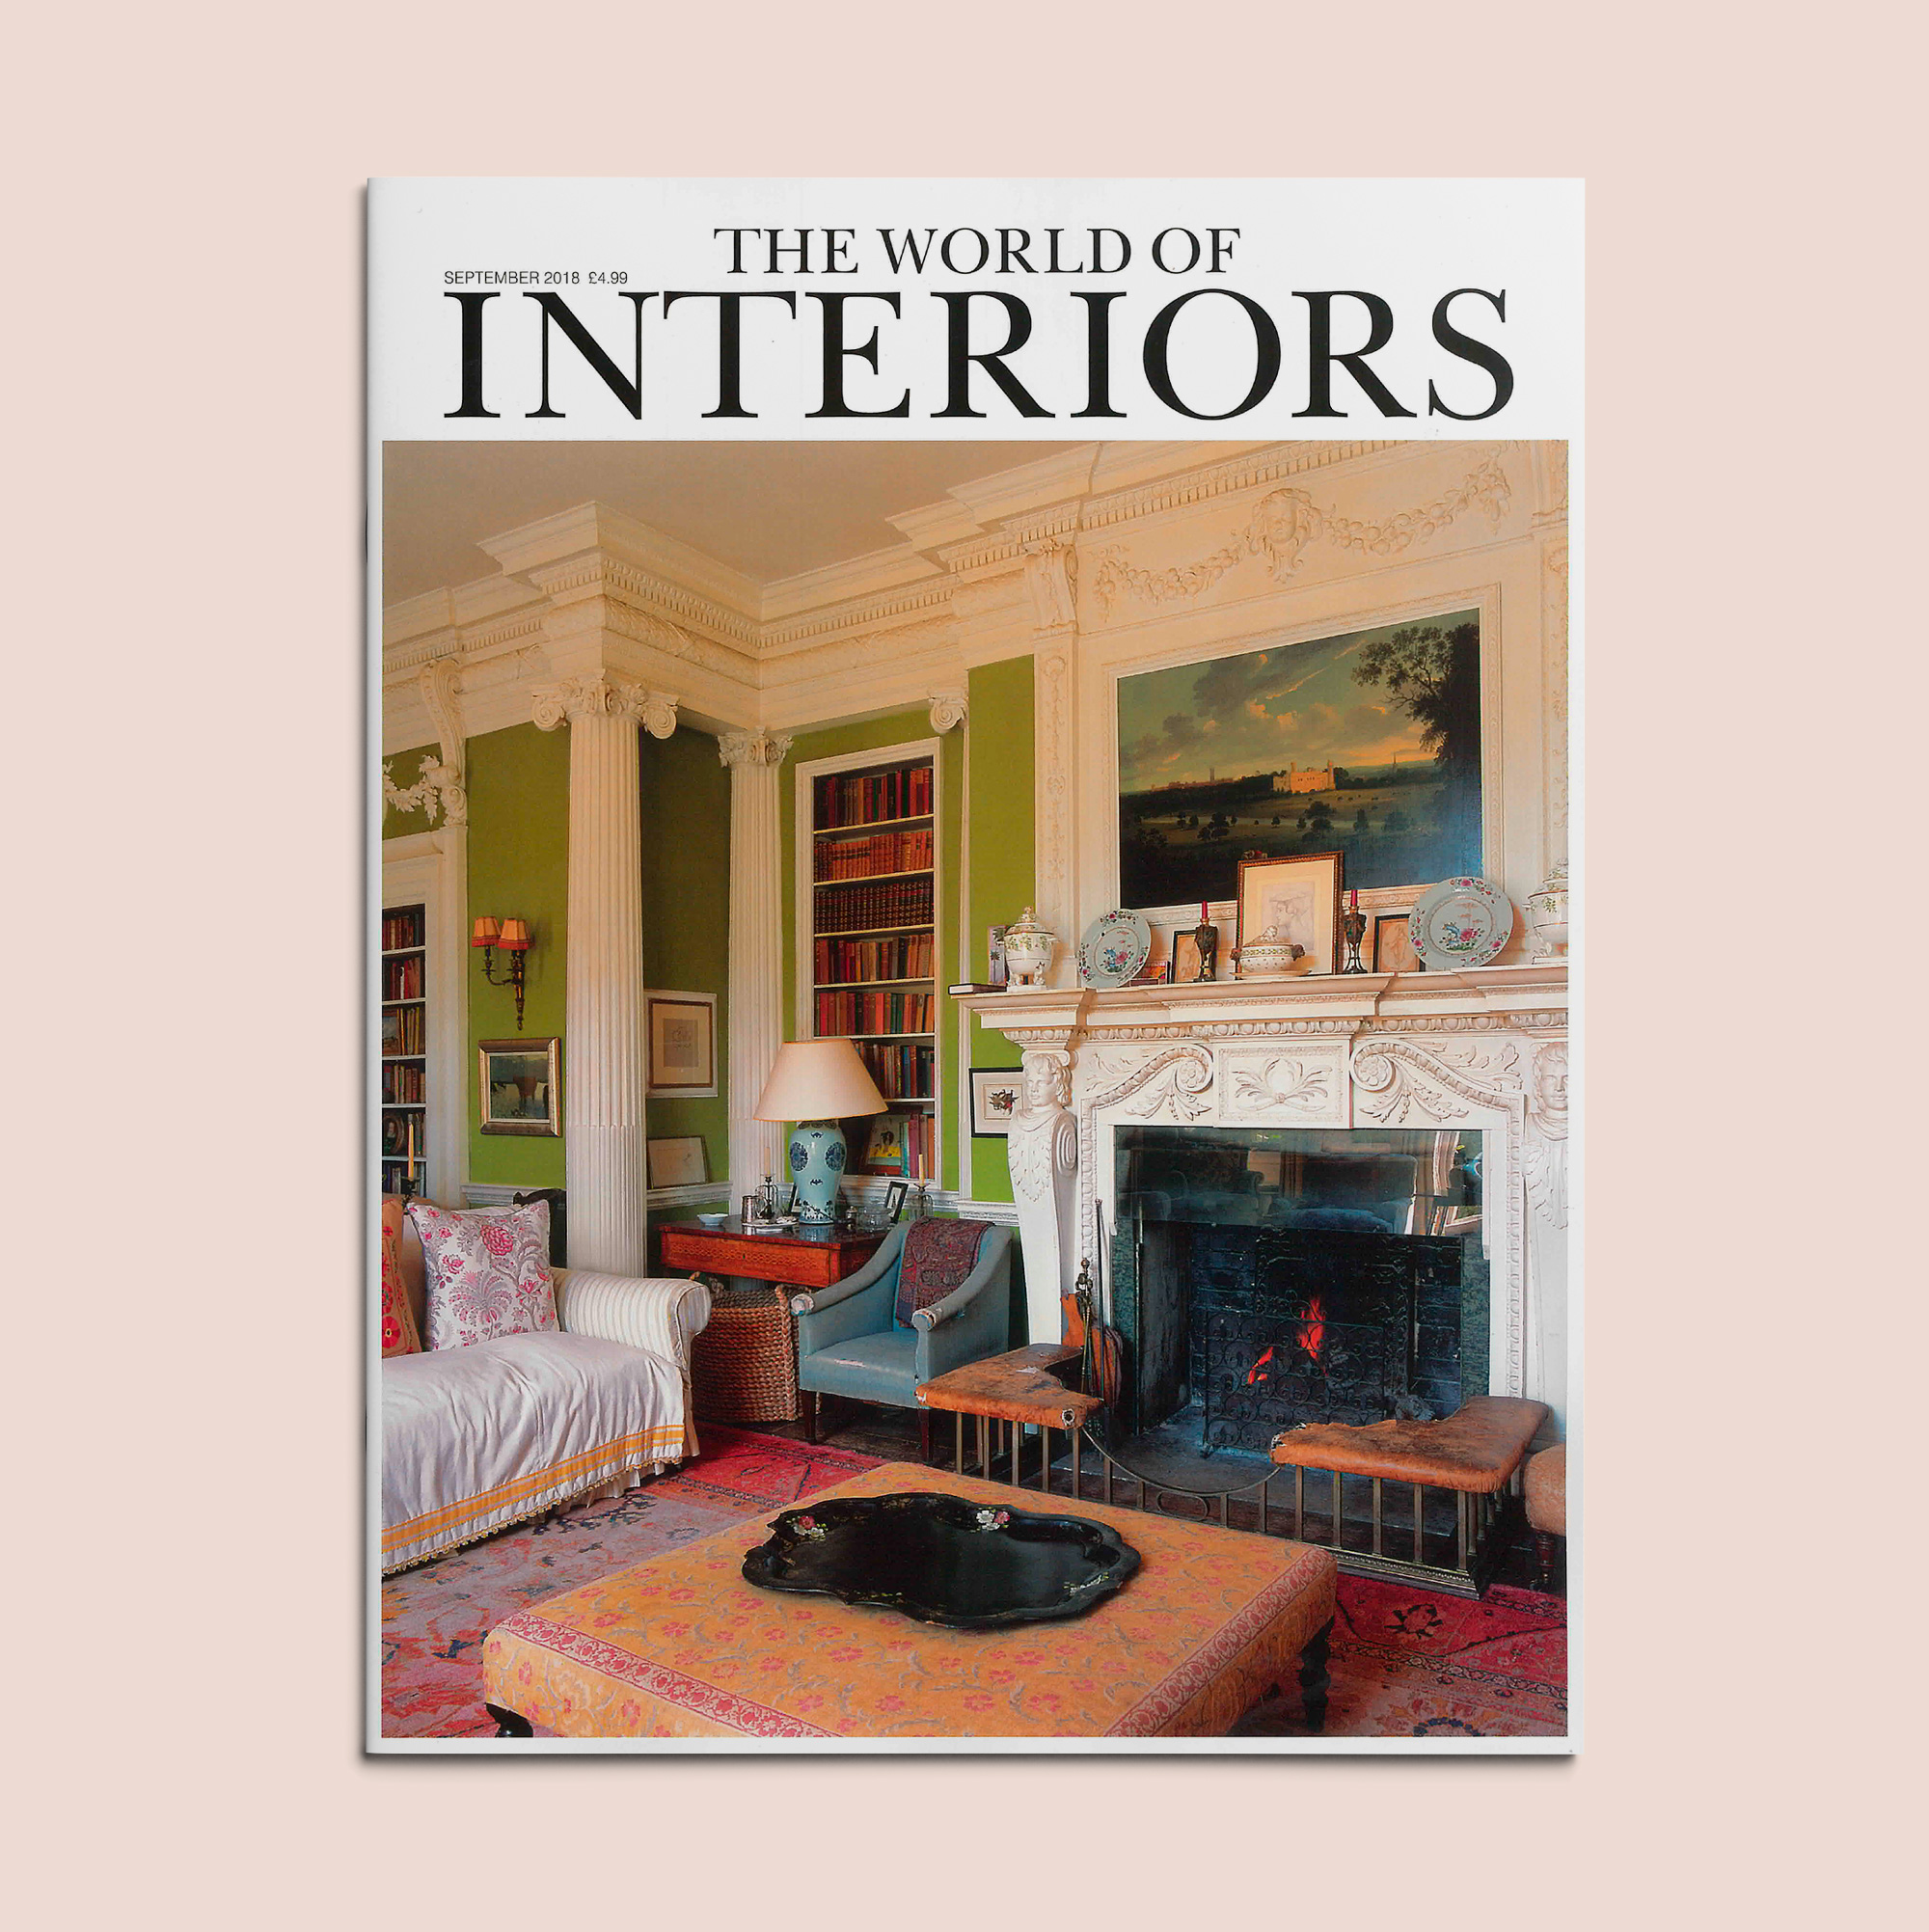 World-of-Interiors-cover-2018.jpg